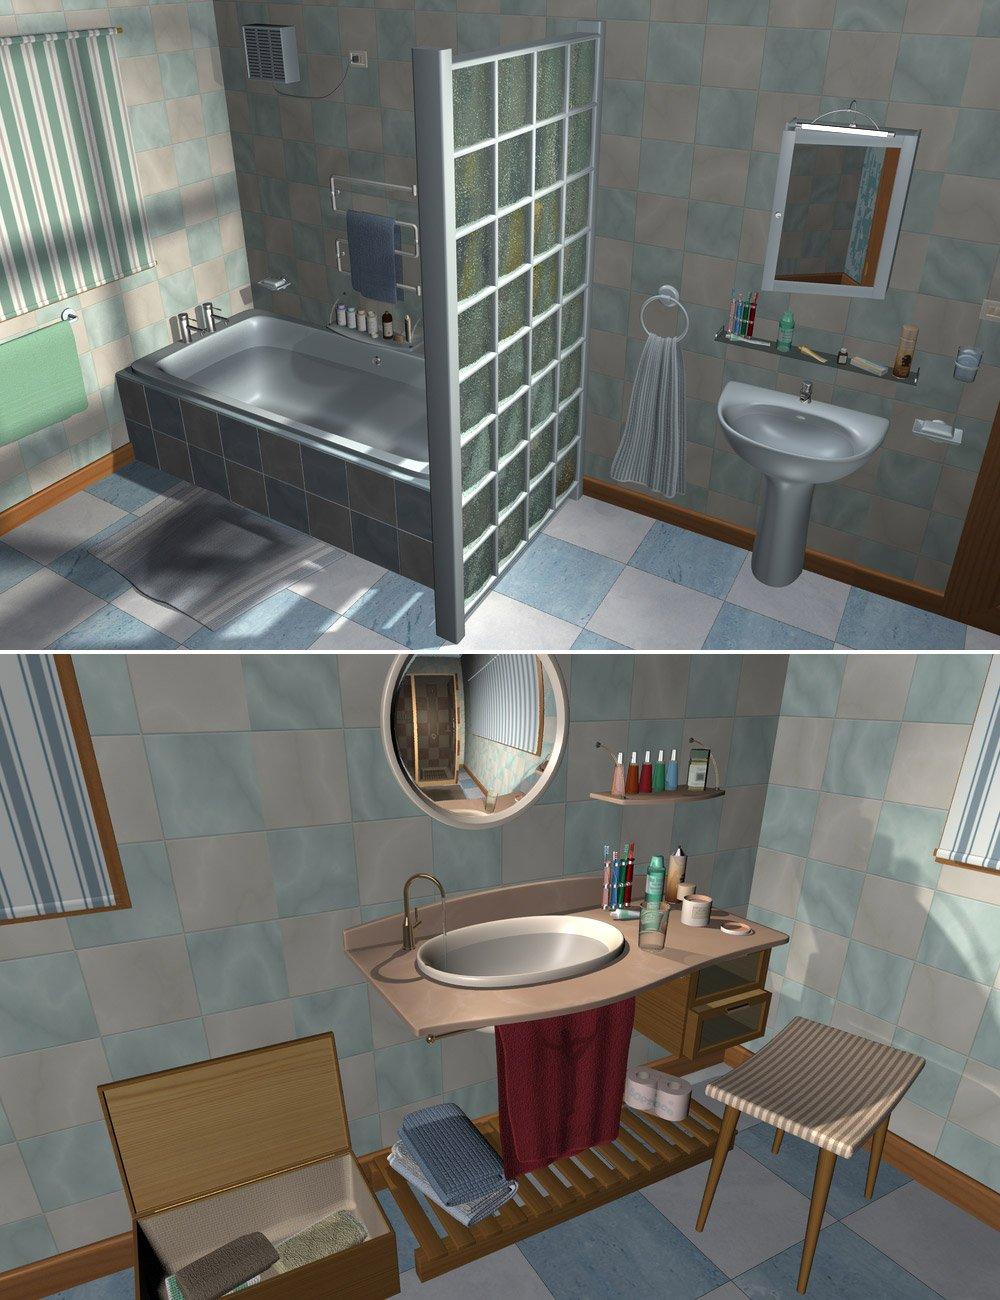 Home One Bathroom by: maclean, 3D Models by Daz 3D